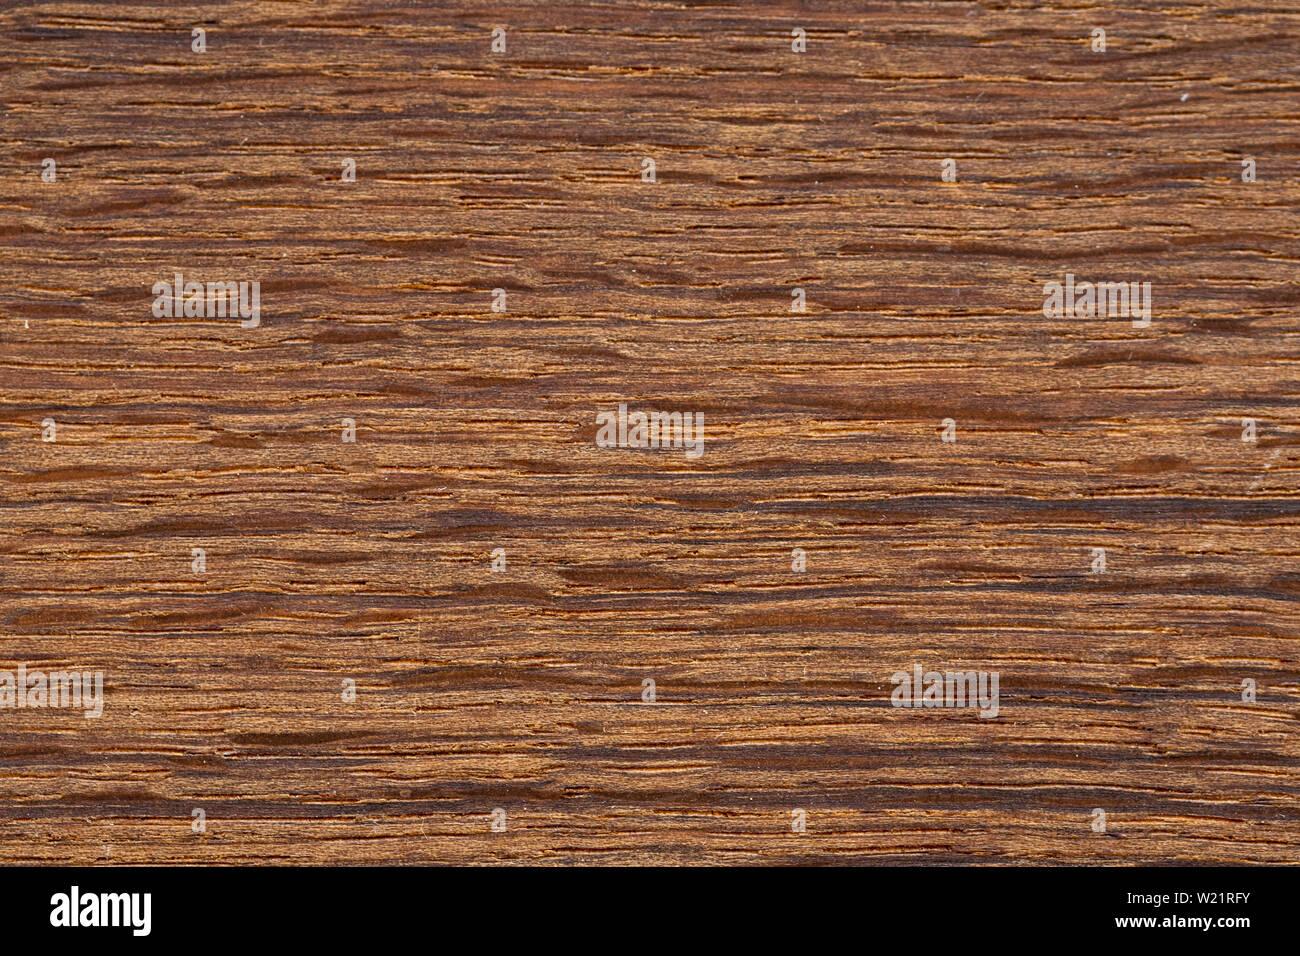 wood cuttingboard pattern texture brown - Stock Image